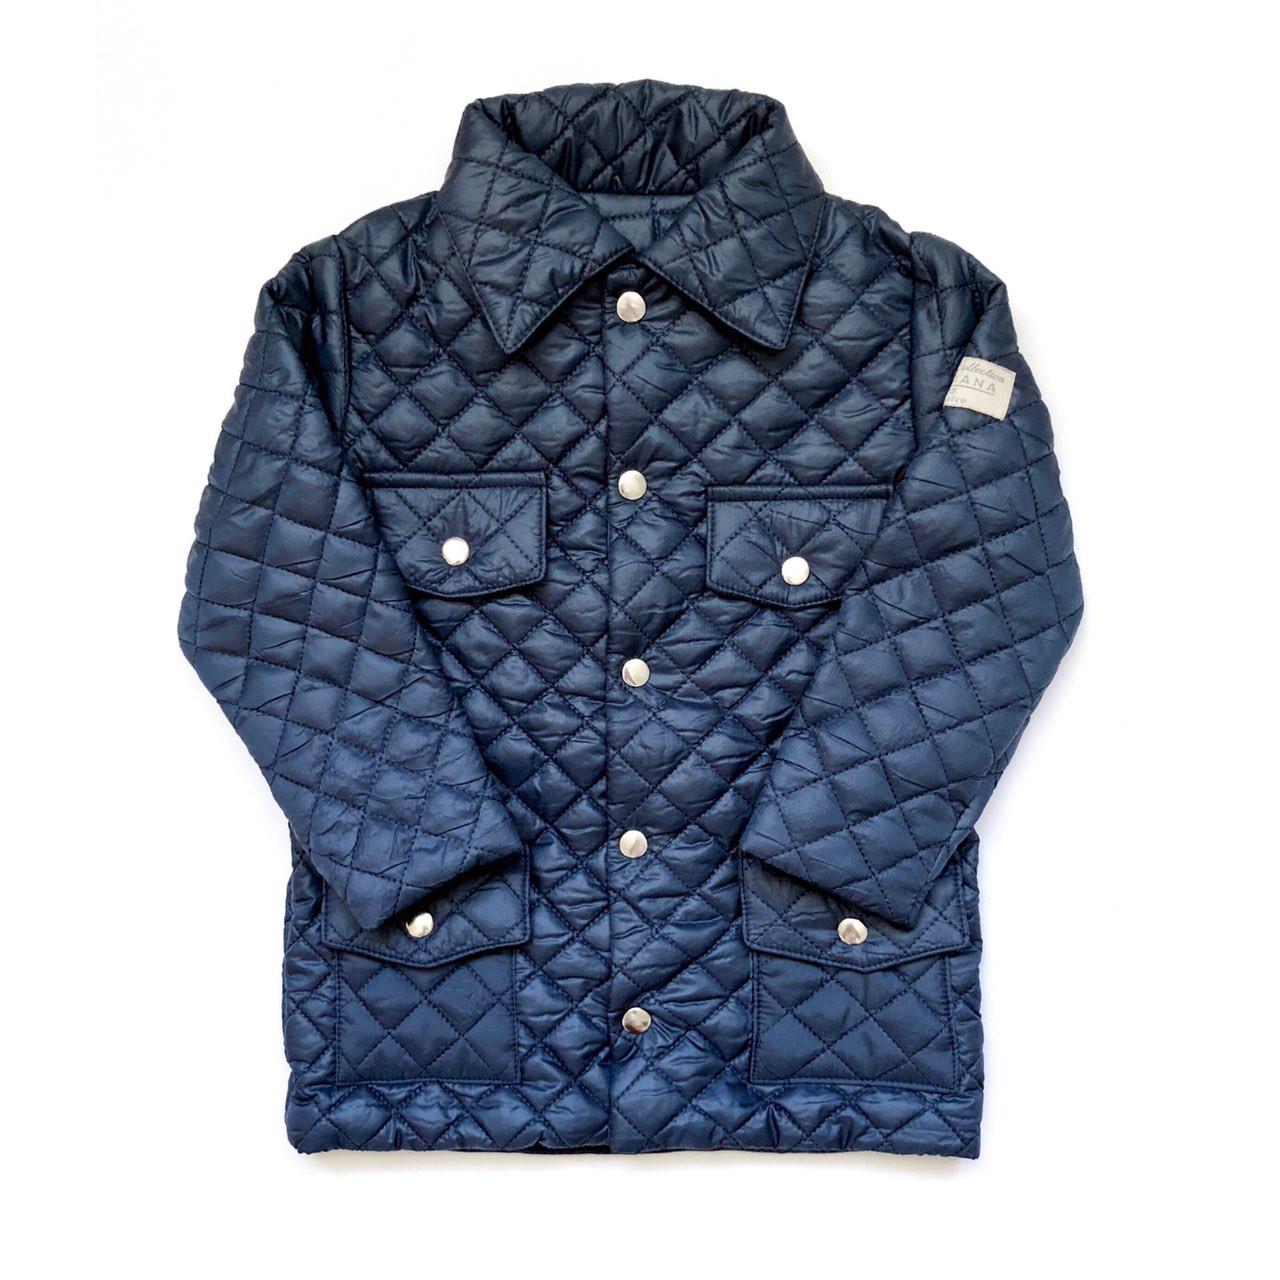 Куртка тёмно-синяя Andriana Kids для мальчика от 1 до 4 лет